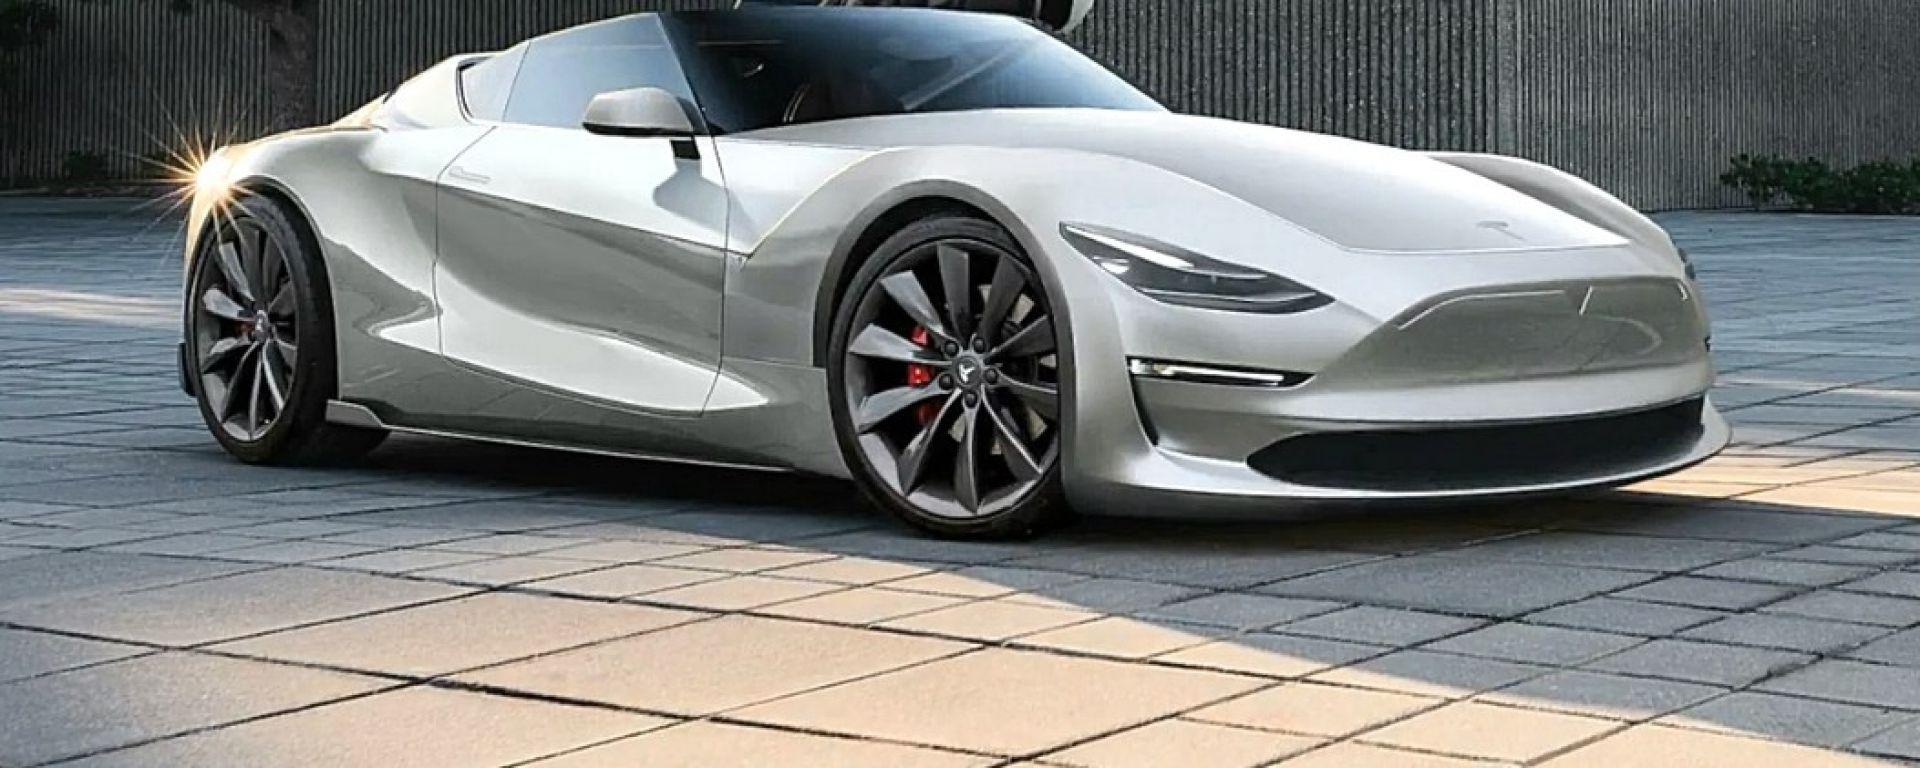 Nuova Tesla Roadster: un rendering di Peisert Design